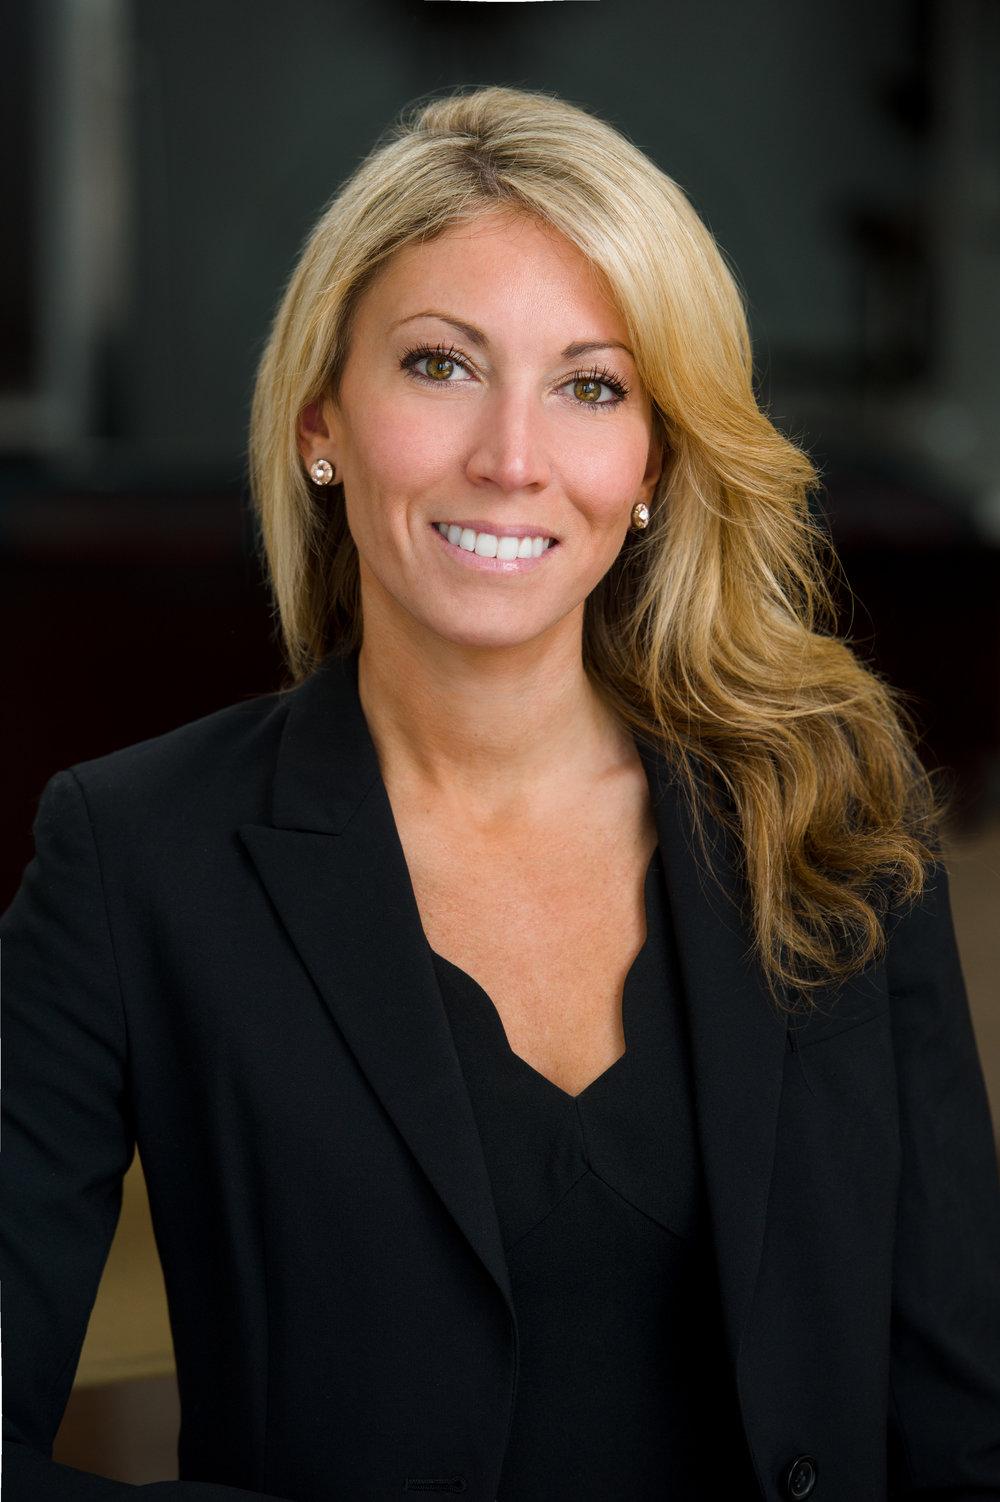 Cassandra L. Boucherit, CFA Vice President